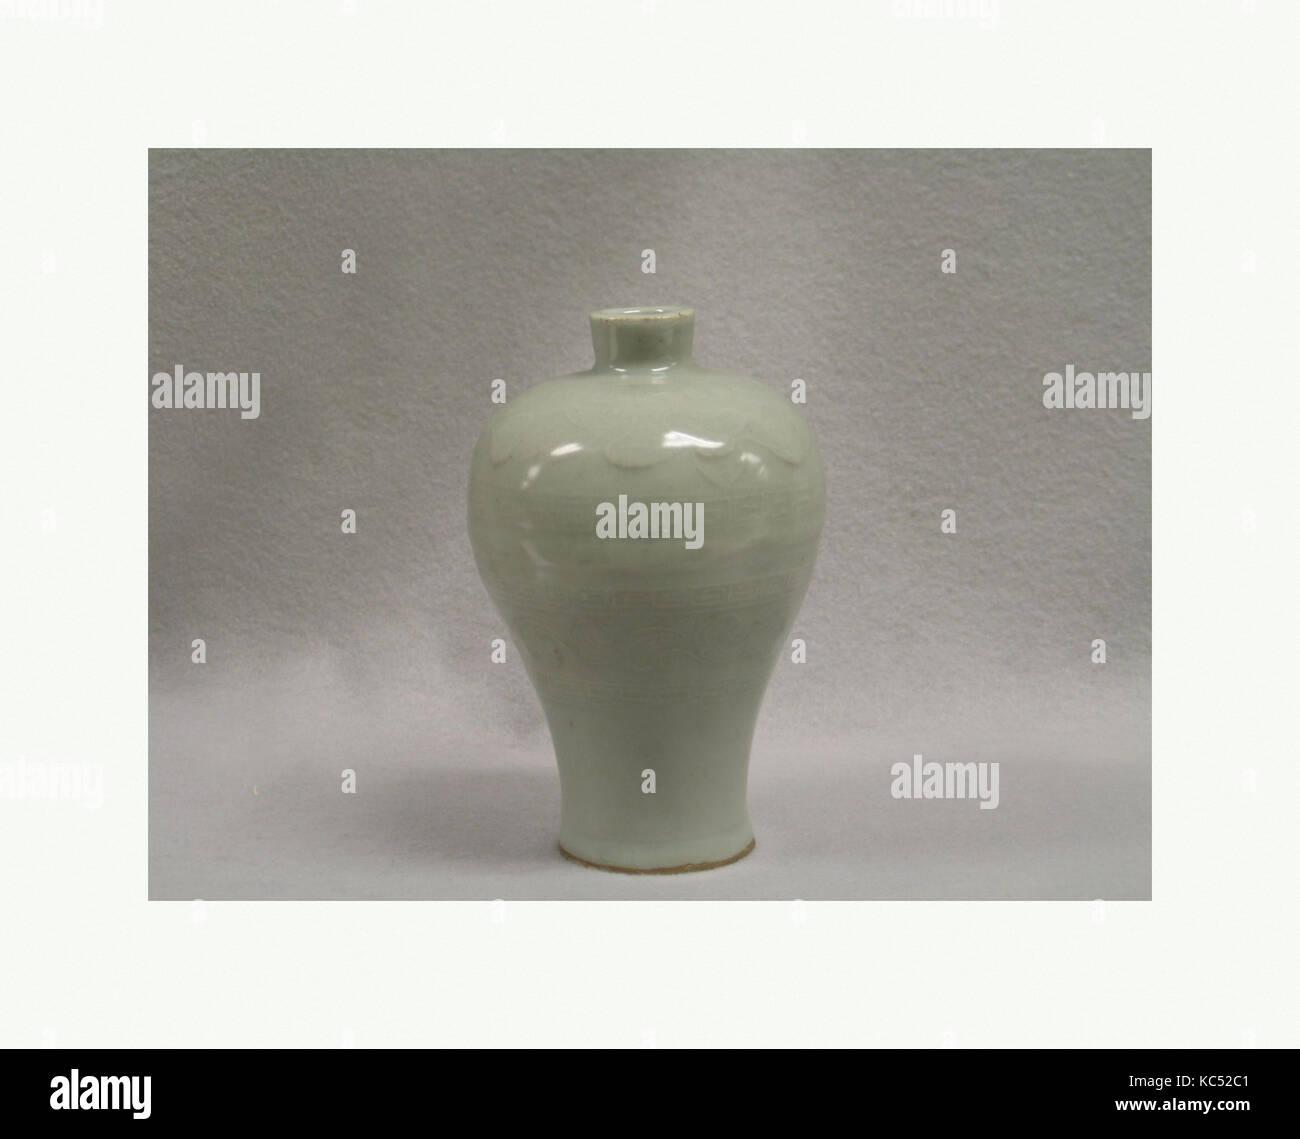 Ming vase stock photos ming vase stock images alamy vase ming dynasty 13681644 china porcelain with celadon glaze reviewsmspy